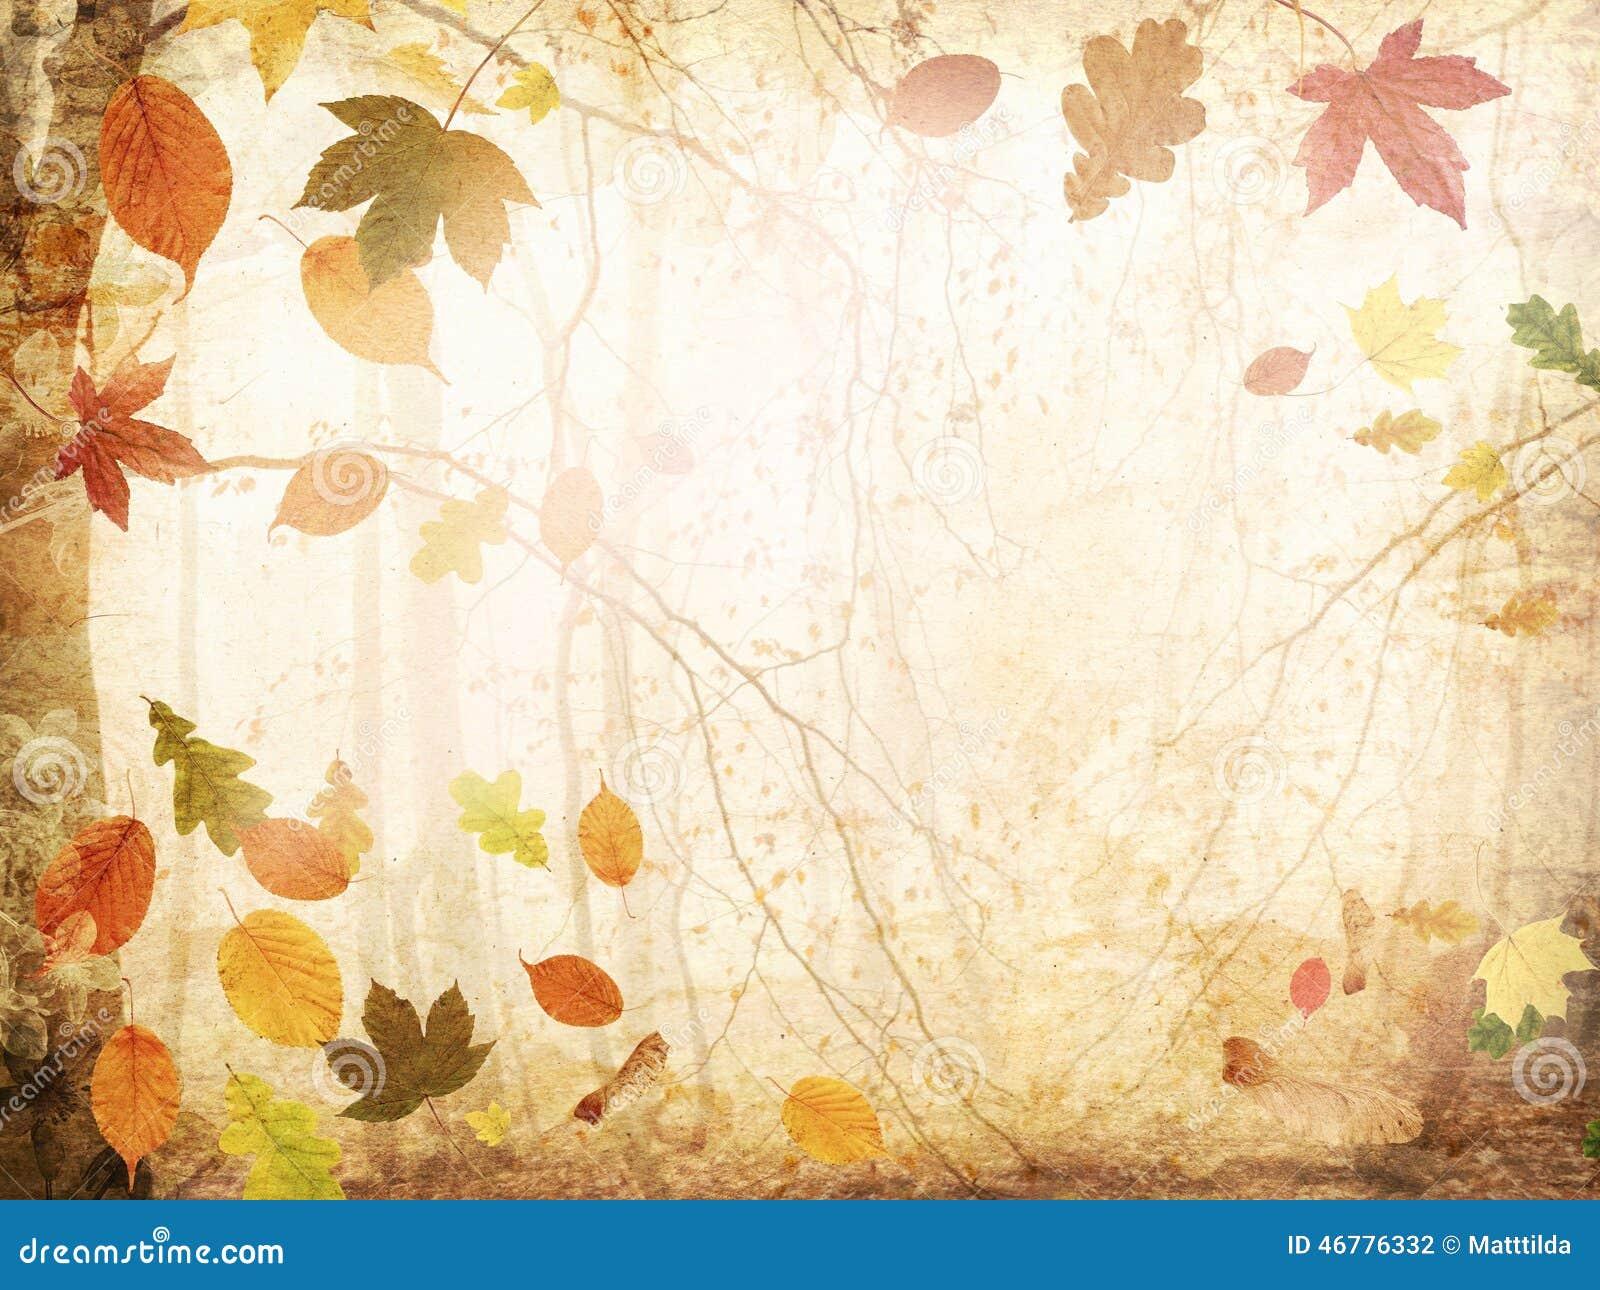 Autumn Leaves Stock Photo Image Of Foliage Leaves